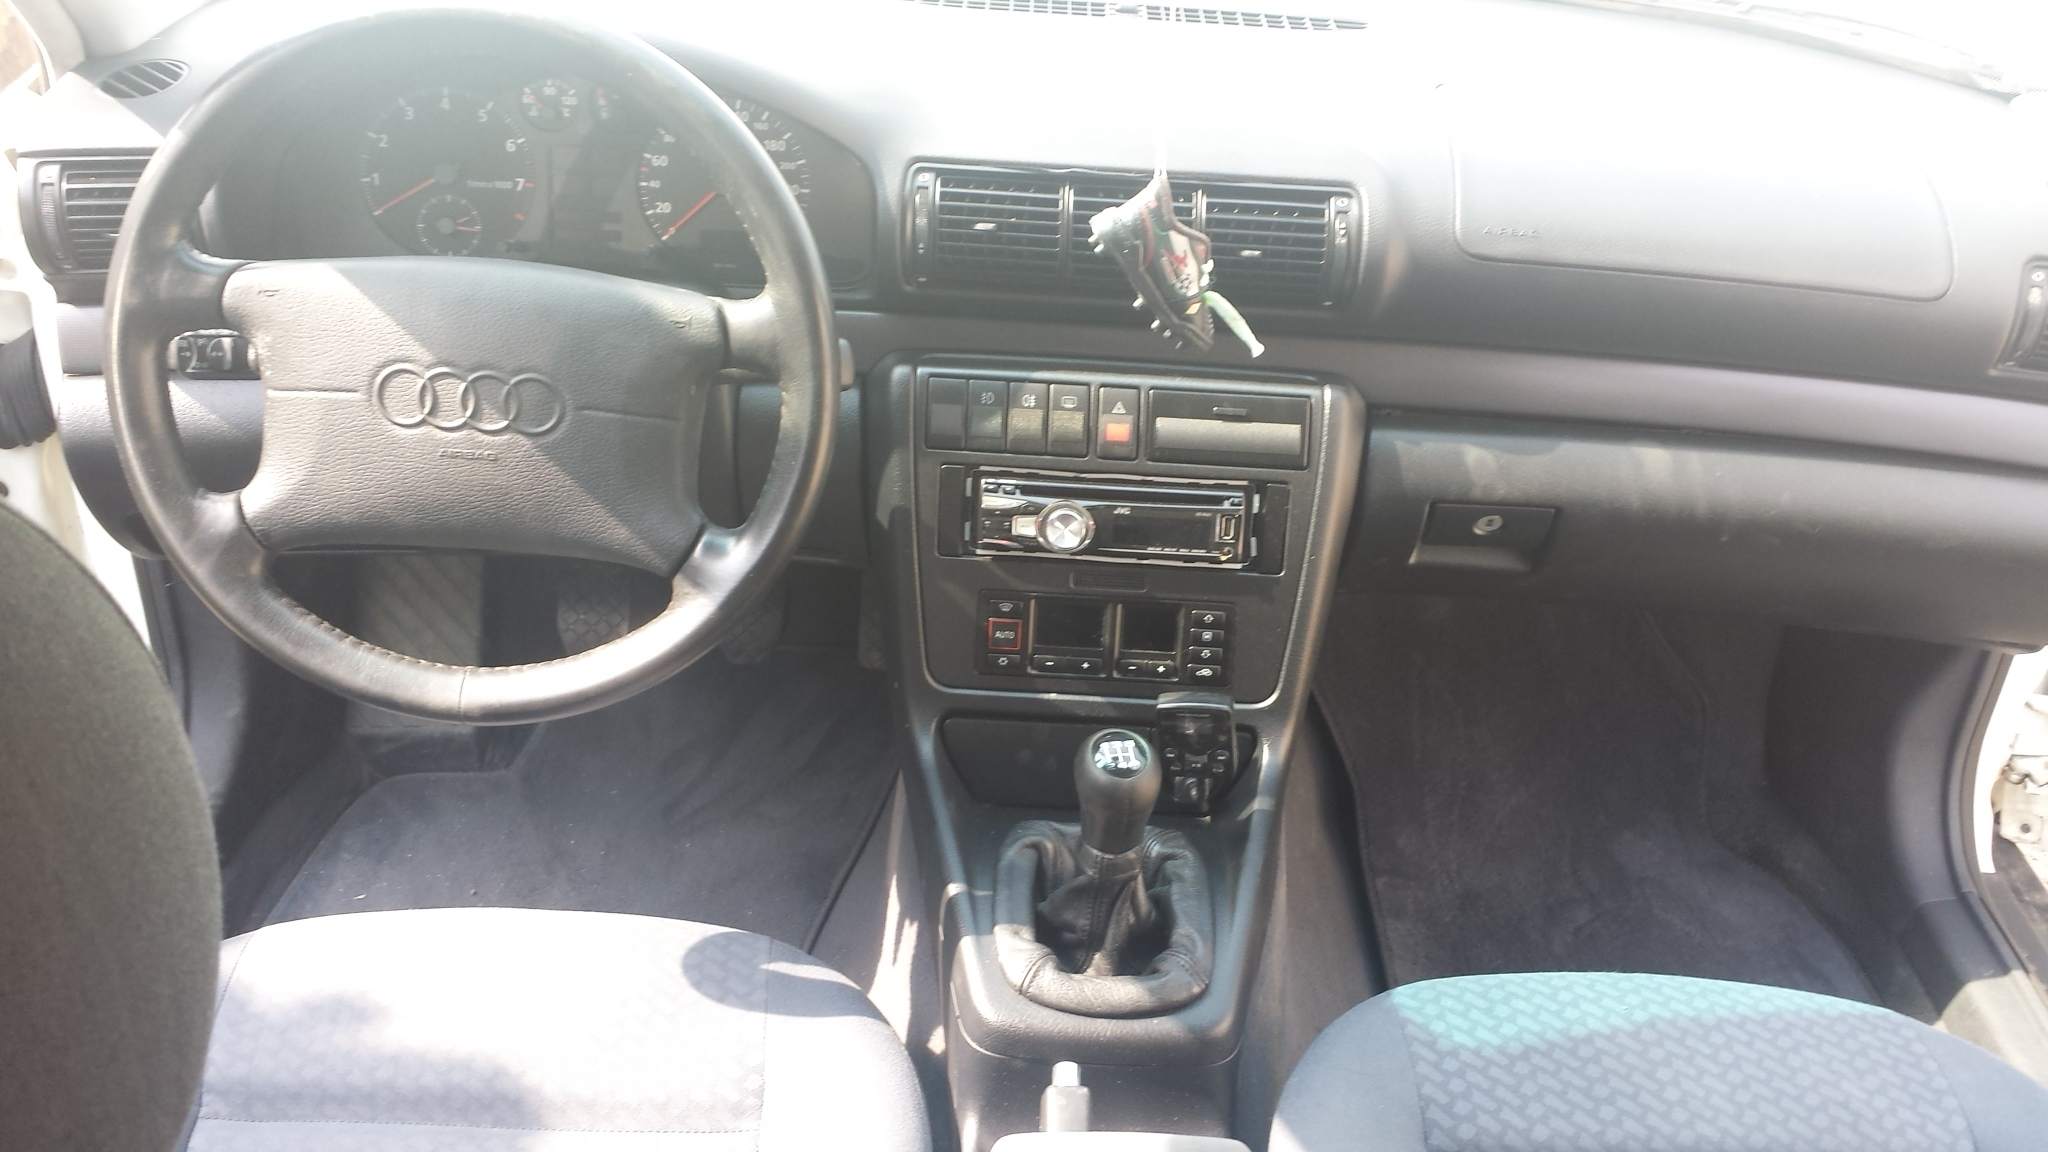 2 900 000fcfa volkswagen audi a4 version 2000 occasion d for Interieur a4 2000